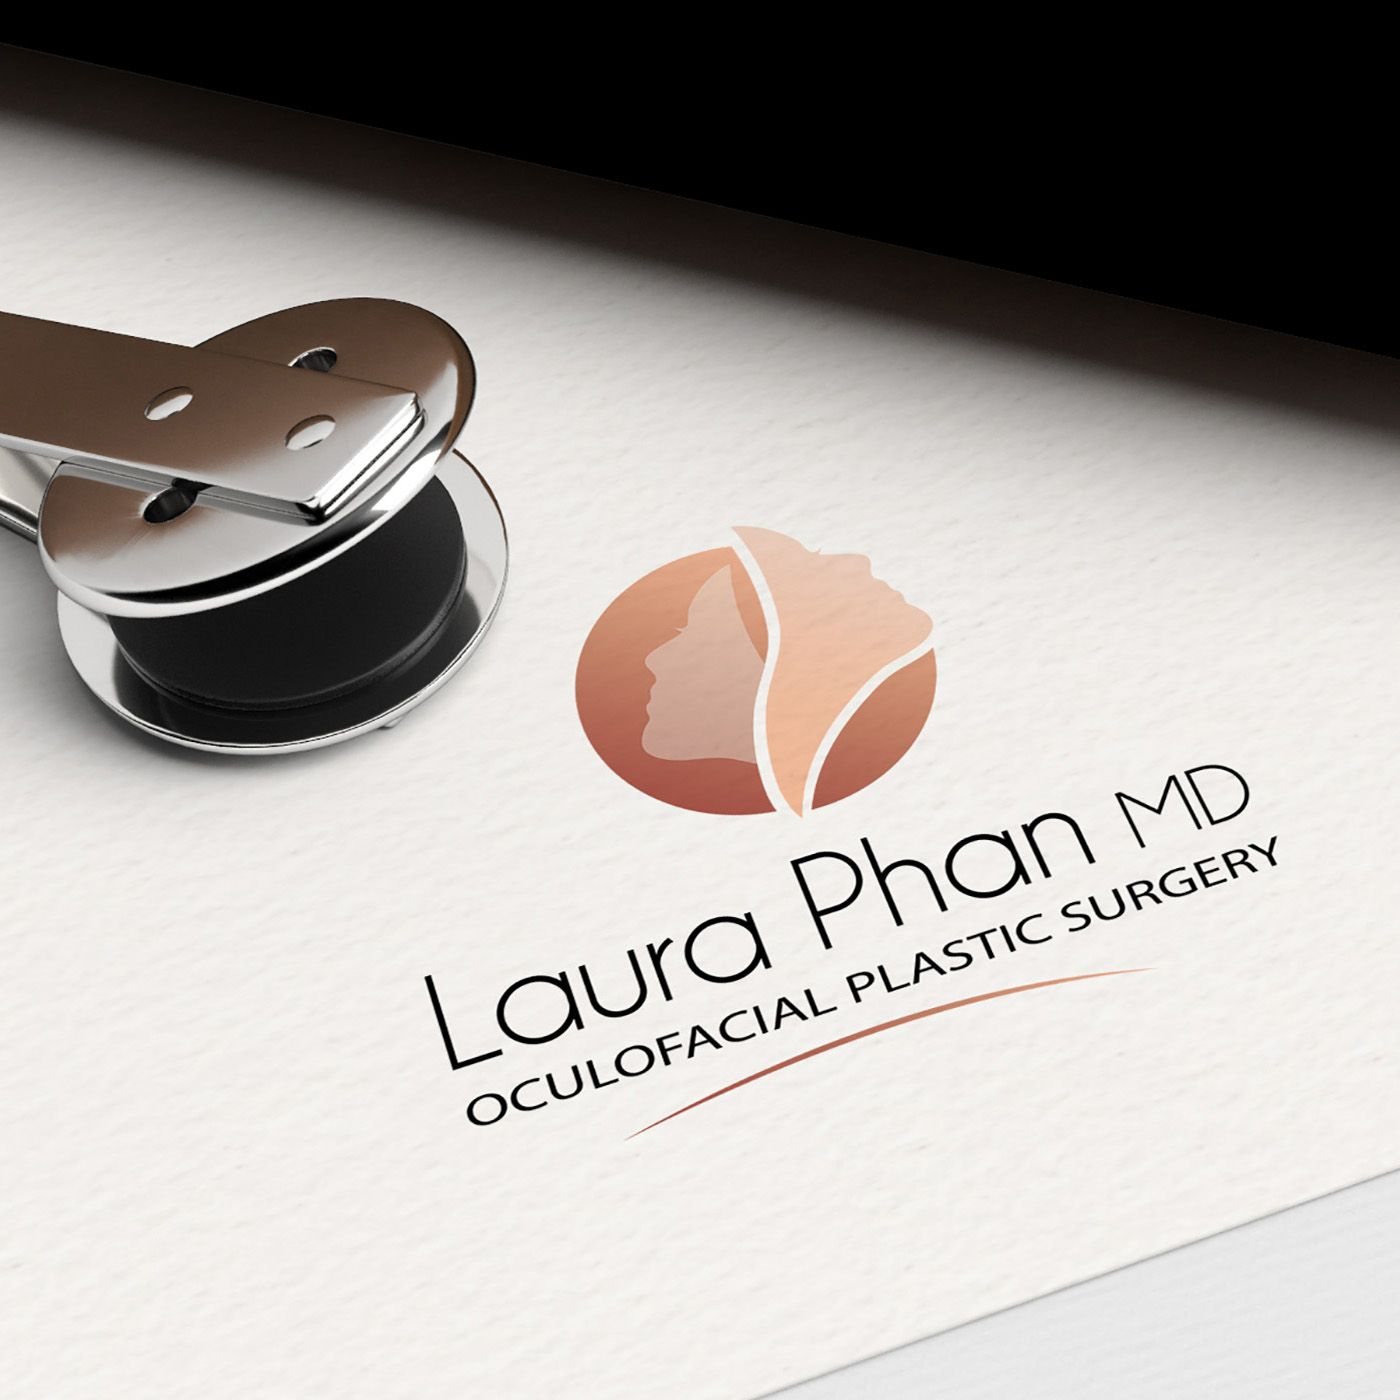 Pin by Biki Graphic Design on Graphic Design Logo design